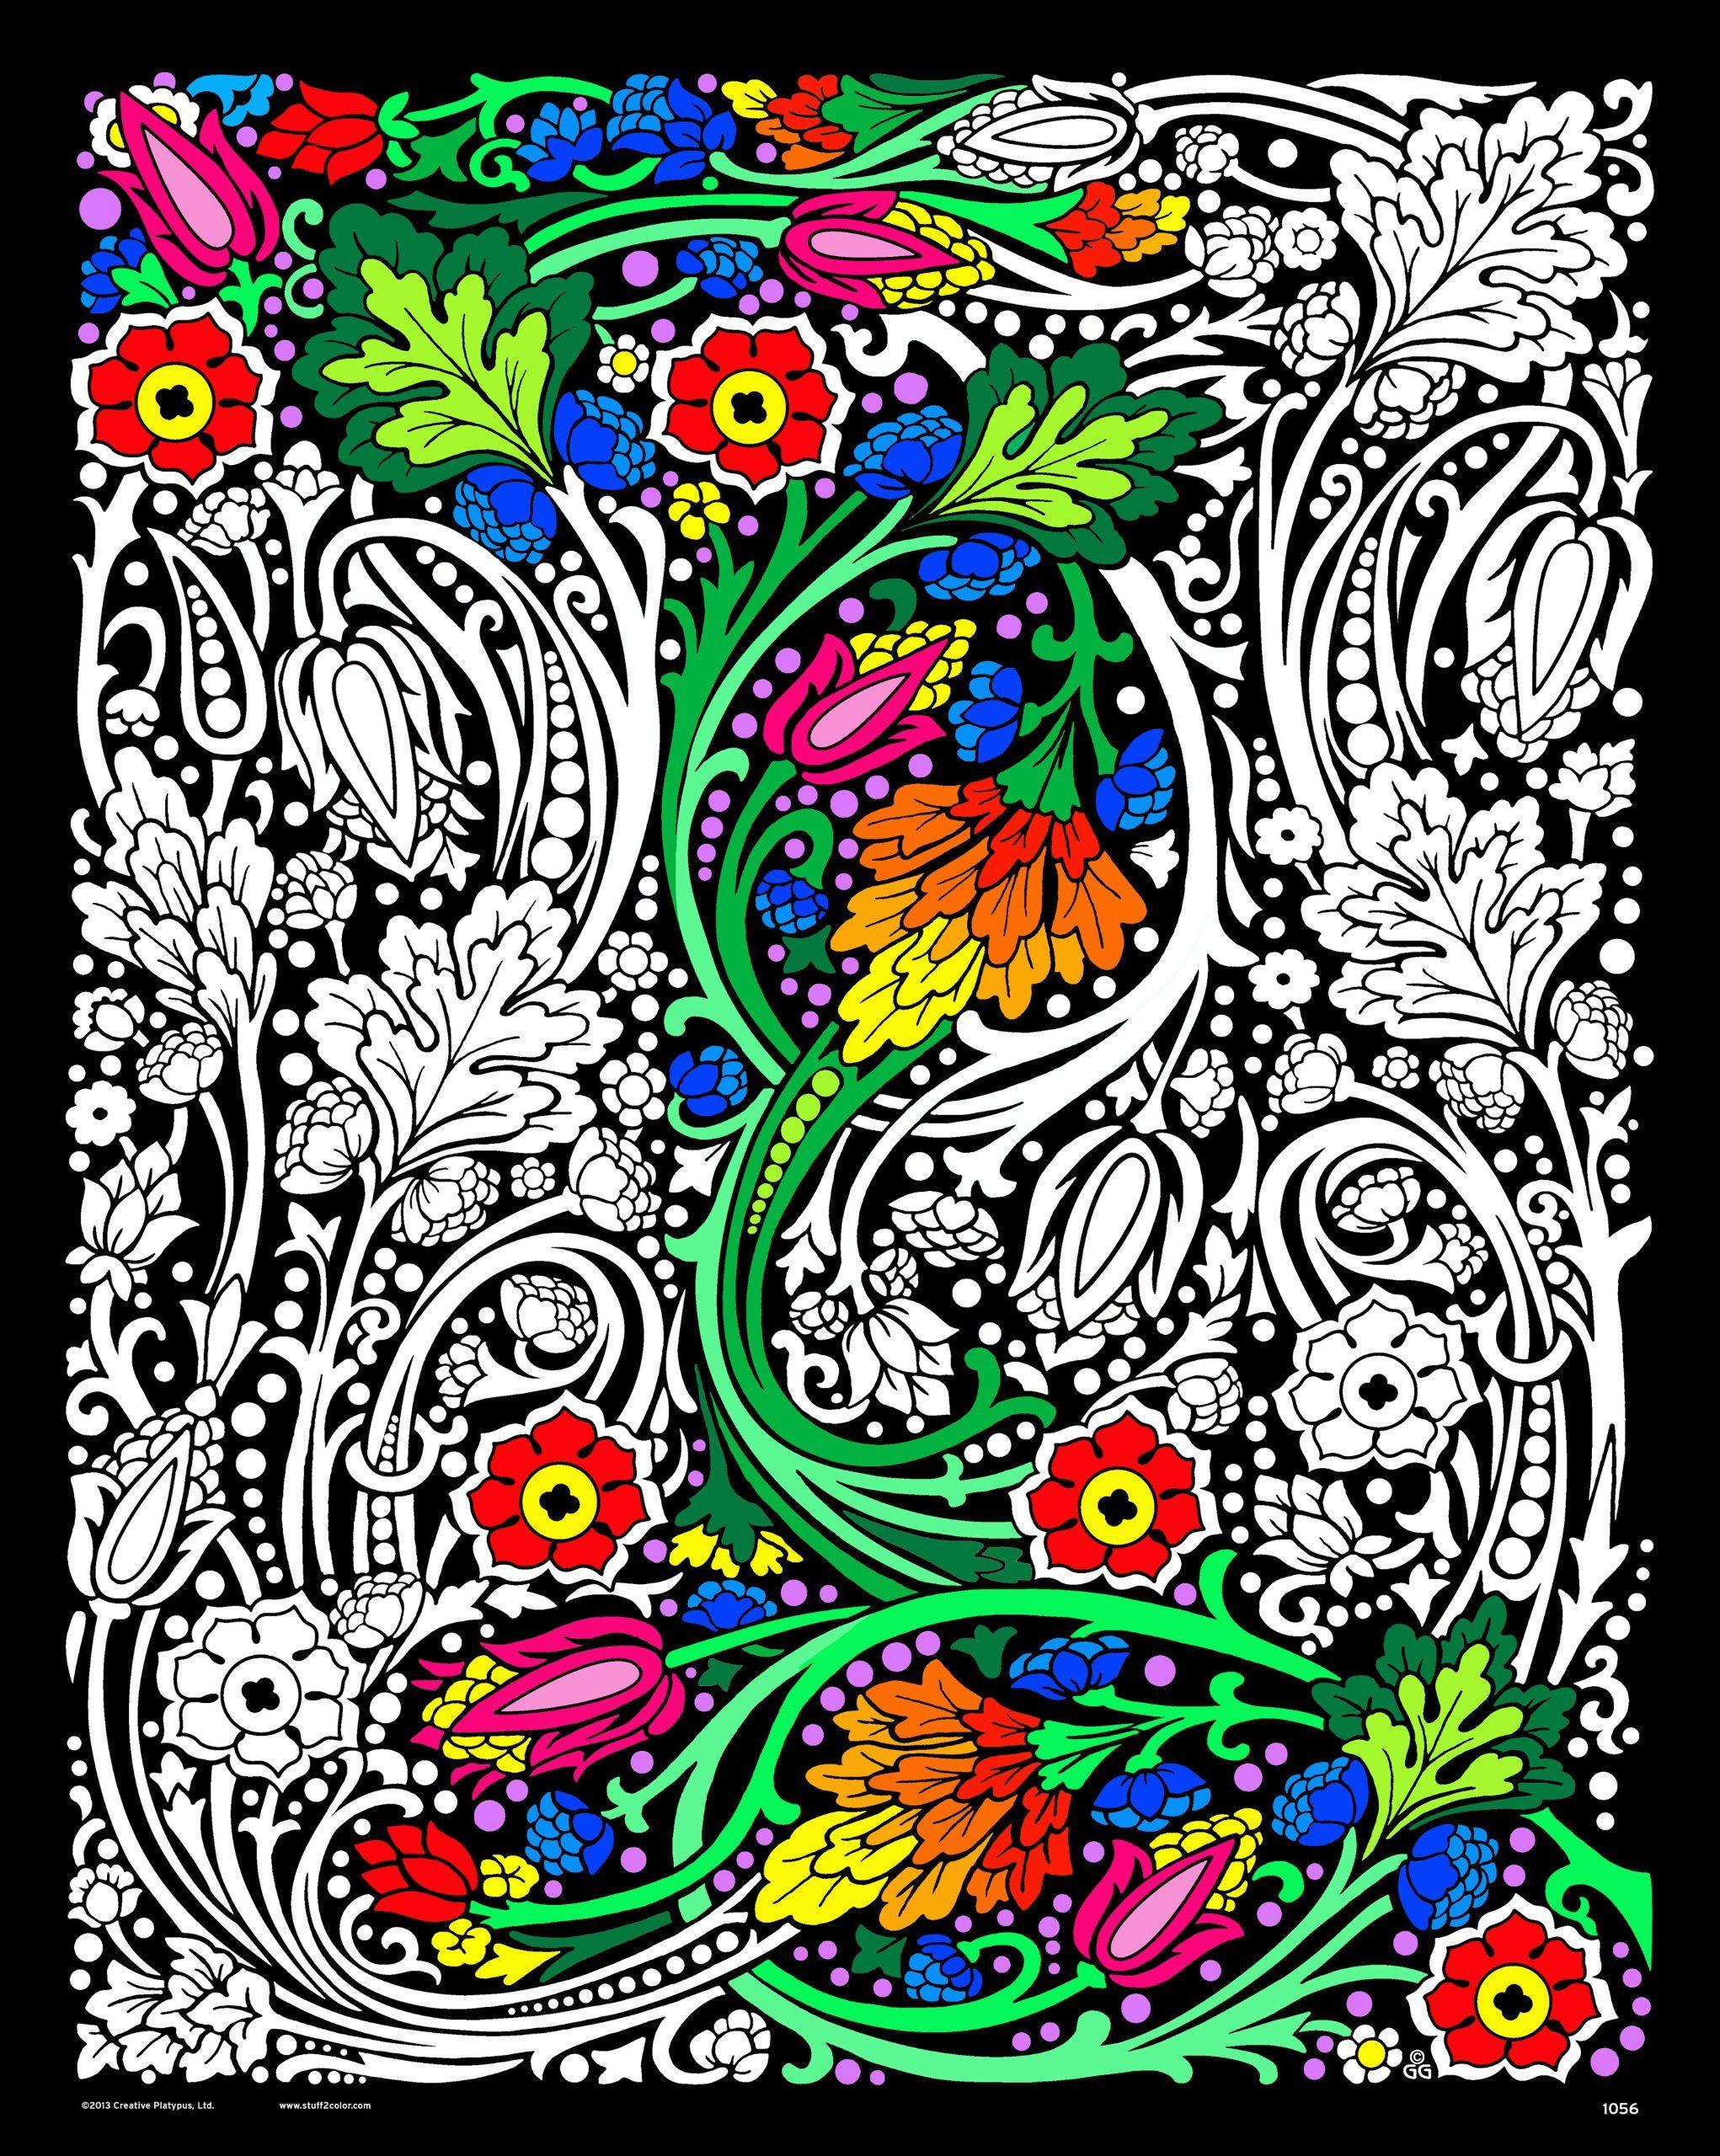 Floral Mania Fuzzy Velvet Poster 16x20